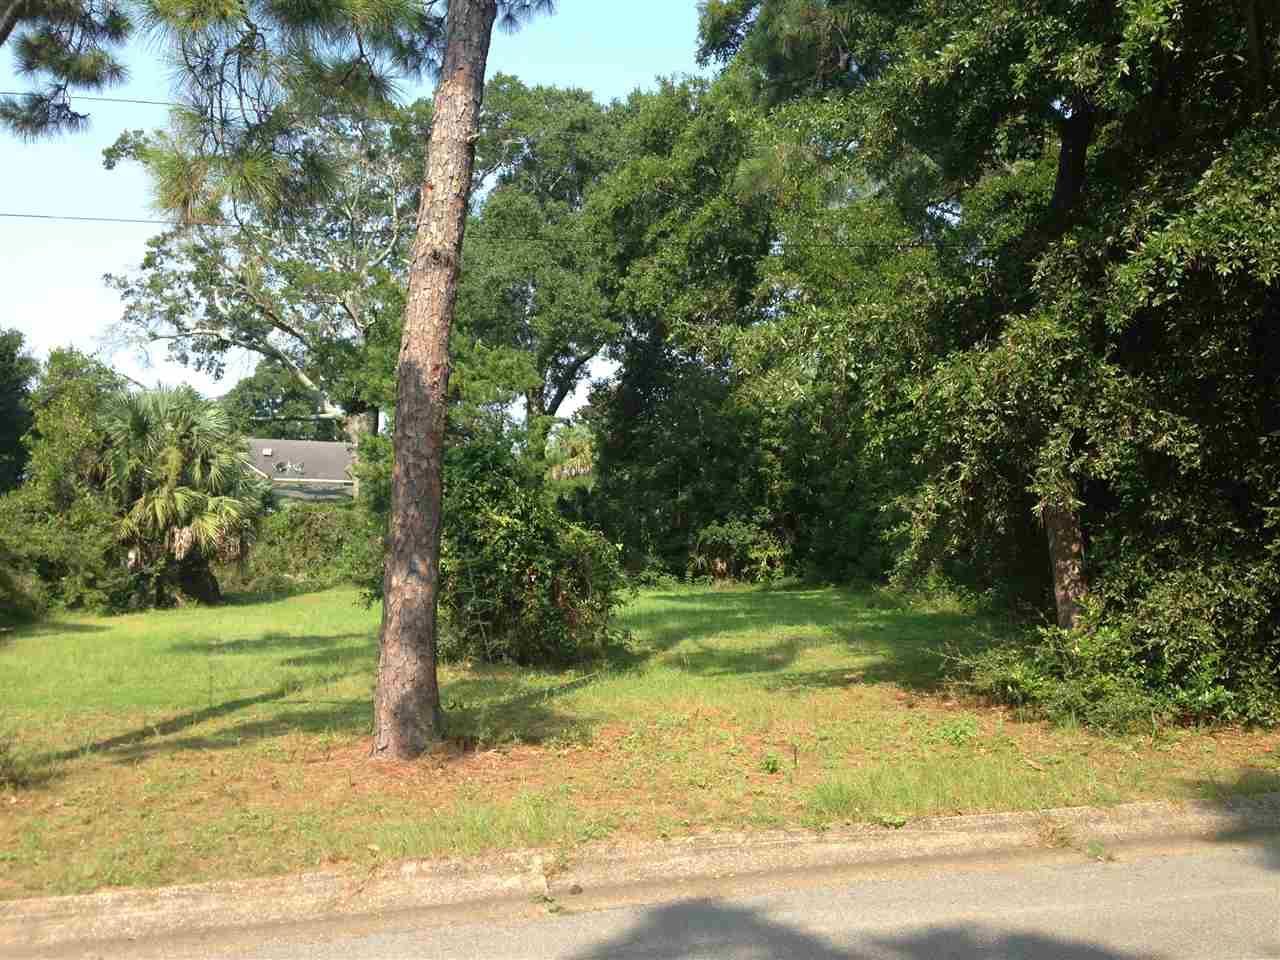 405 N 15th Ave, Pensacola, FL 32501